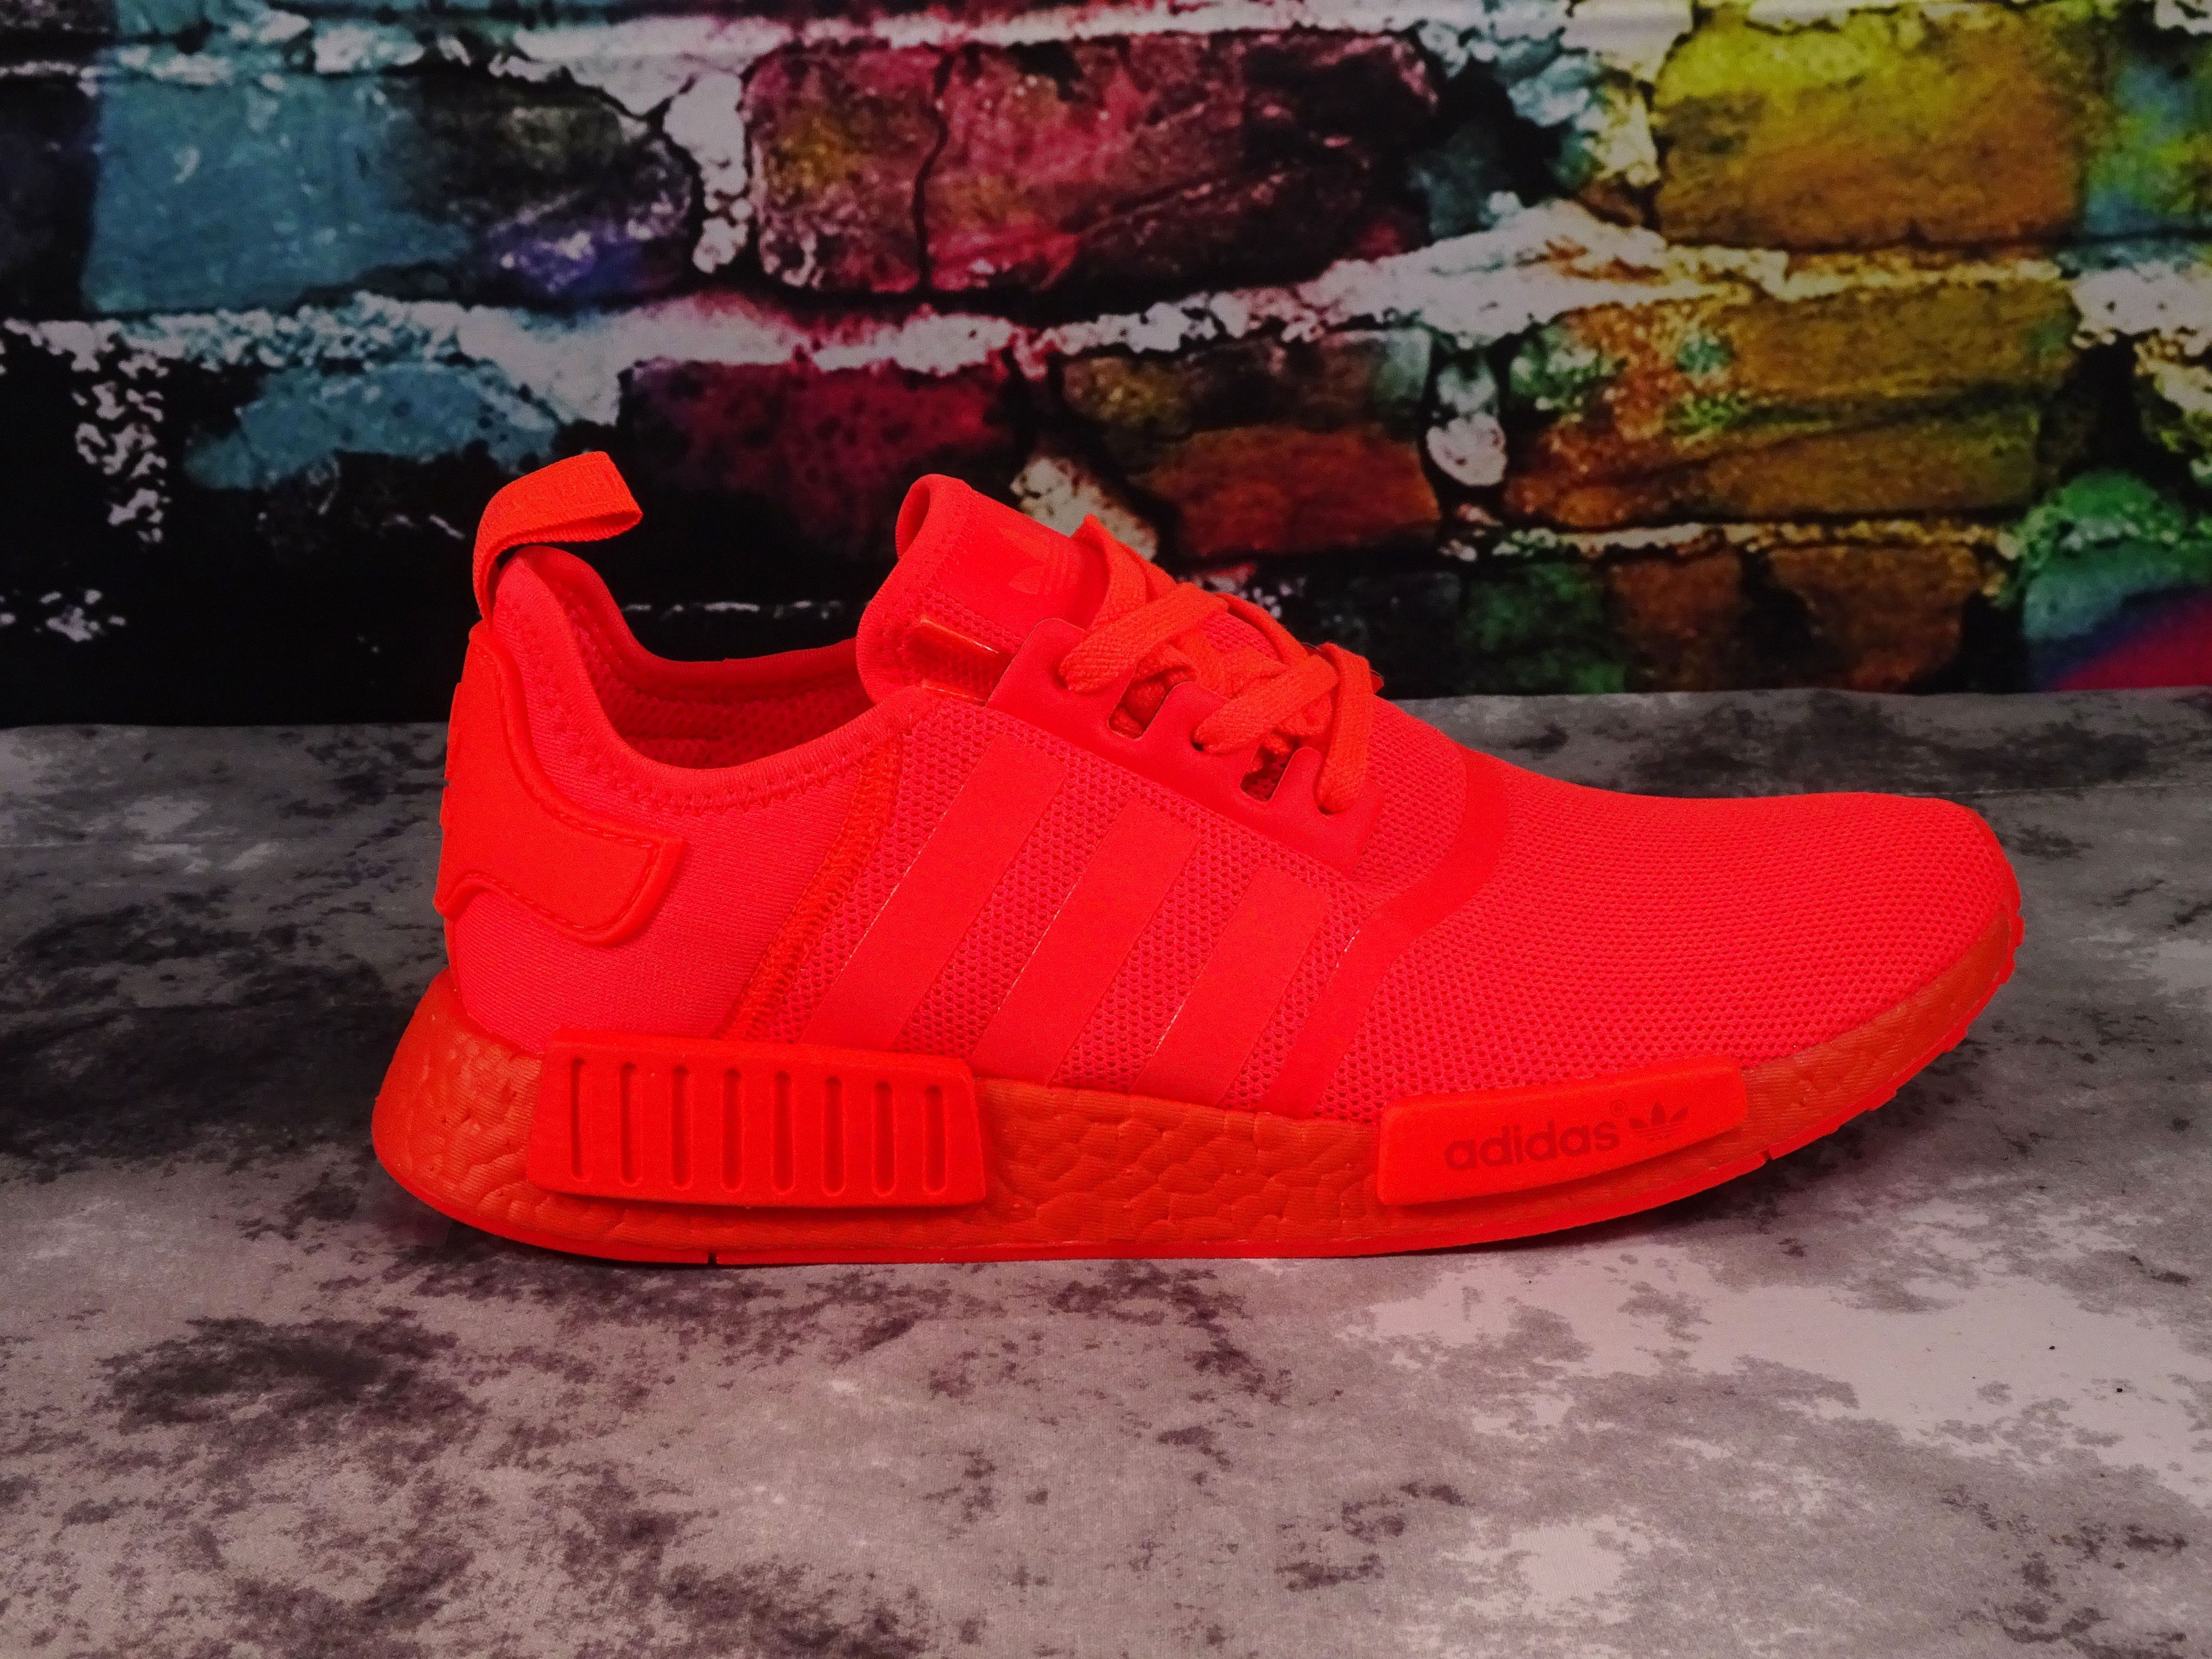 hot sale online dcf0e 13b8f Adidas NMD R1 Triple Solar Red | Cute stuff | Red adidas ...